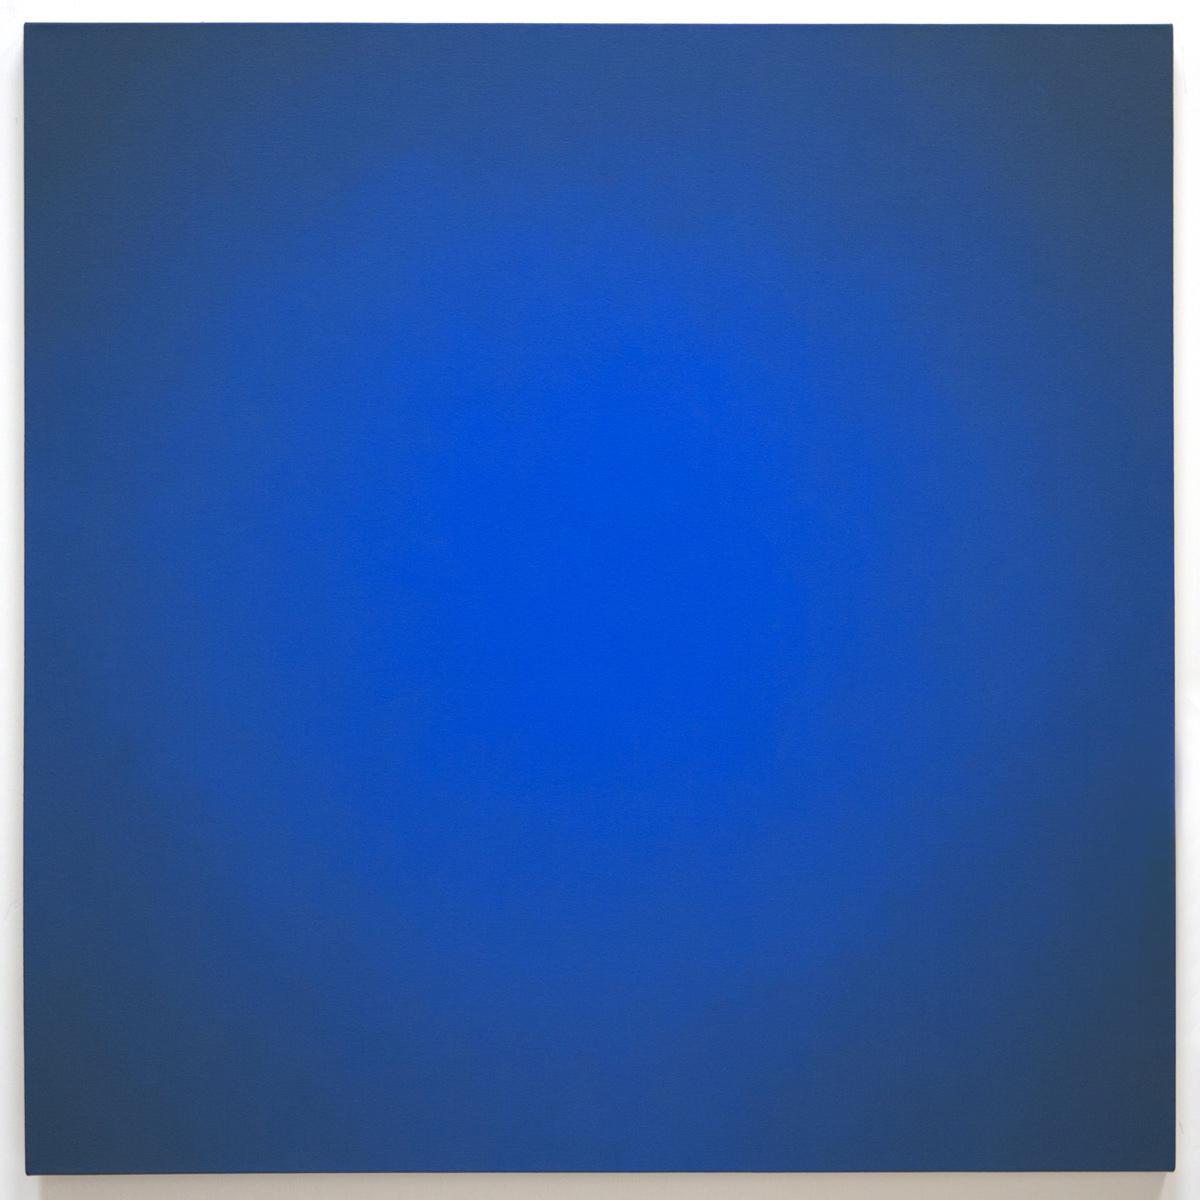 Blue Orange #6 (Red-Orange), Equivalence Blue Orange Series, 2005, oil on canvas, 30 x 30 in. (76 x 76 cm.)